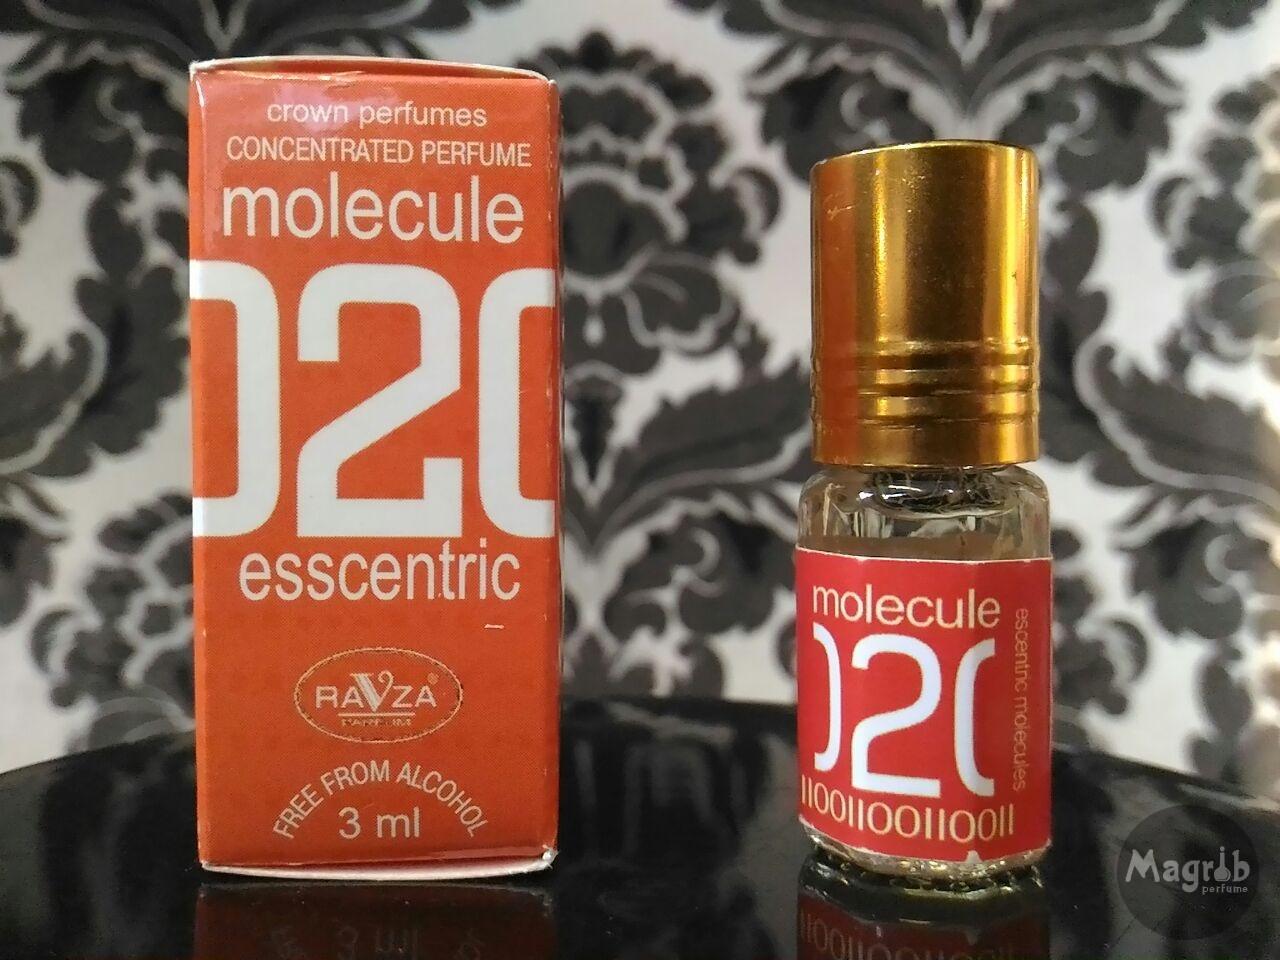 Ravza Molecule 02 3ml - унисекс, масляные духи